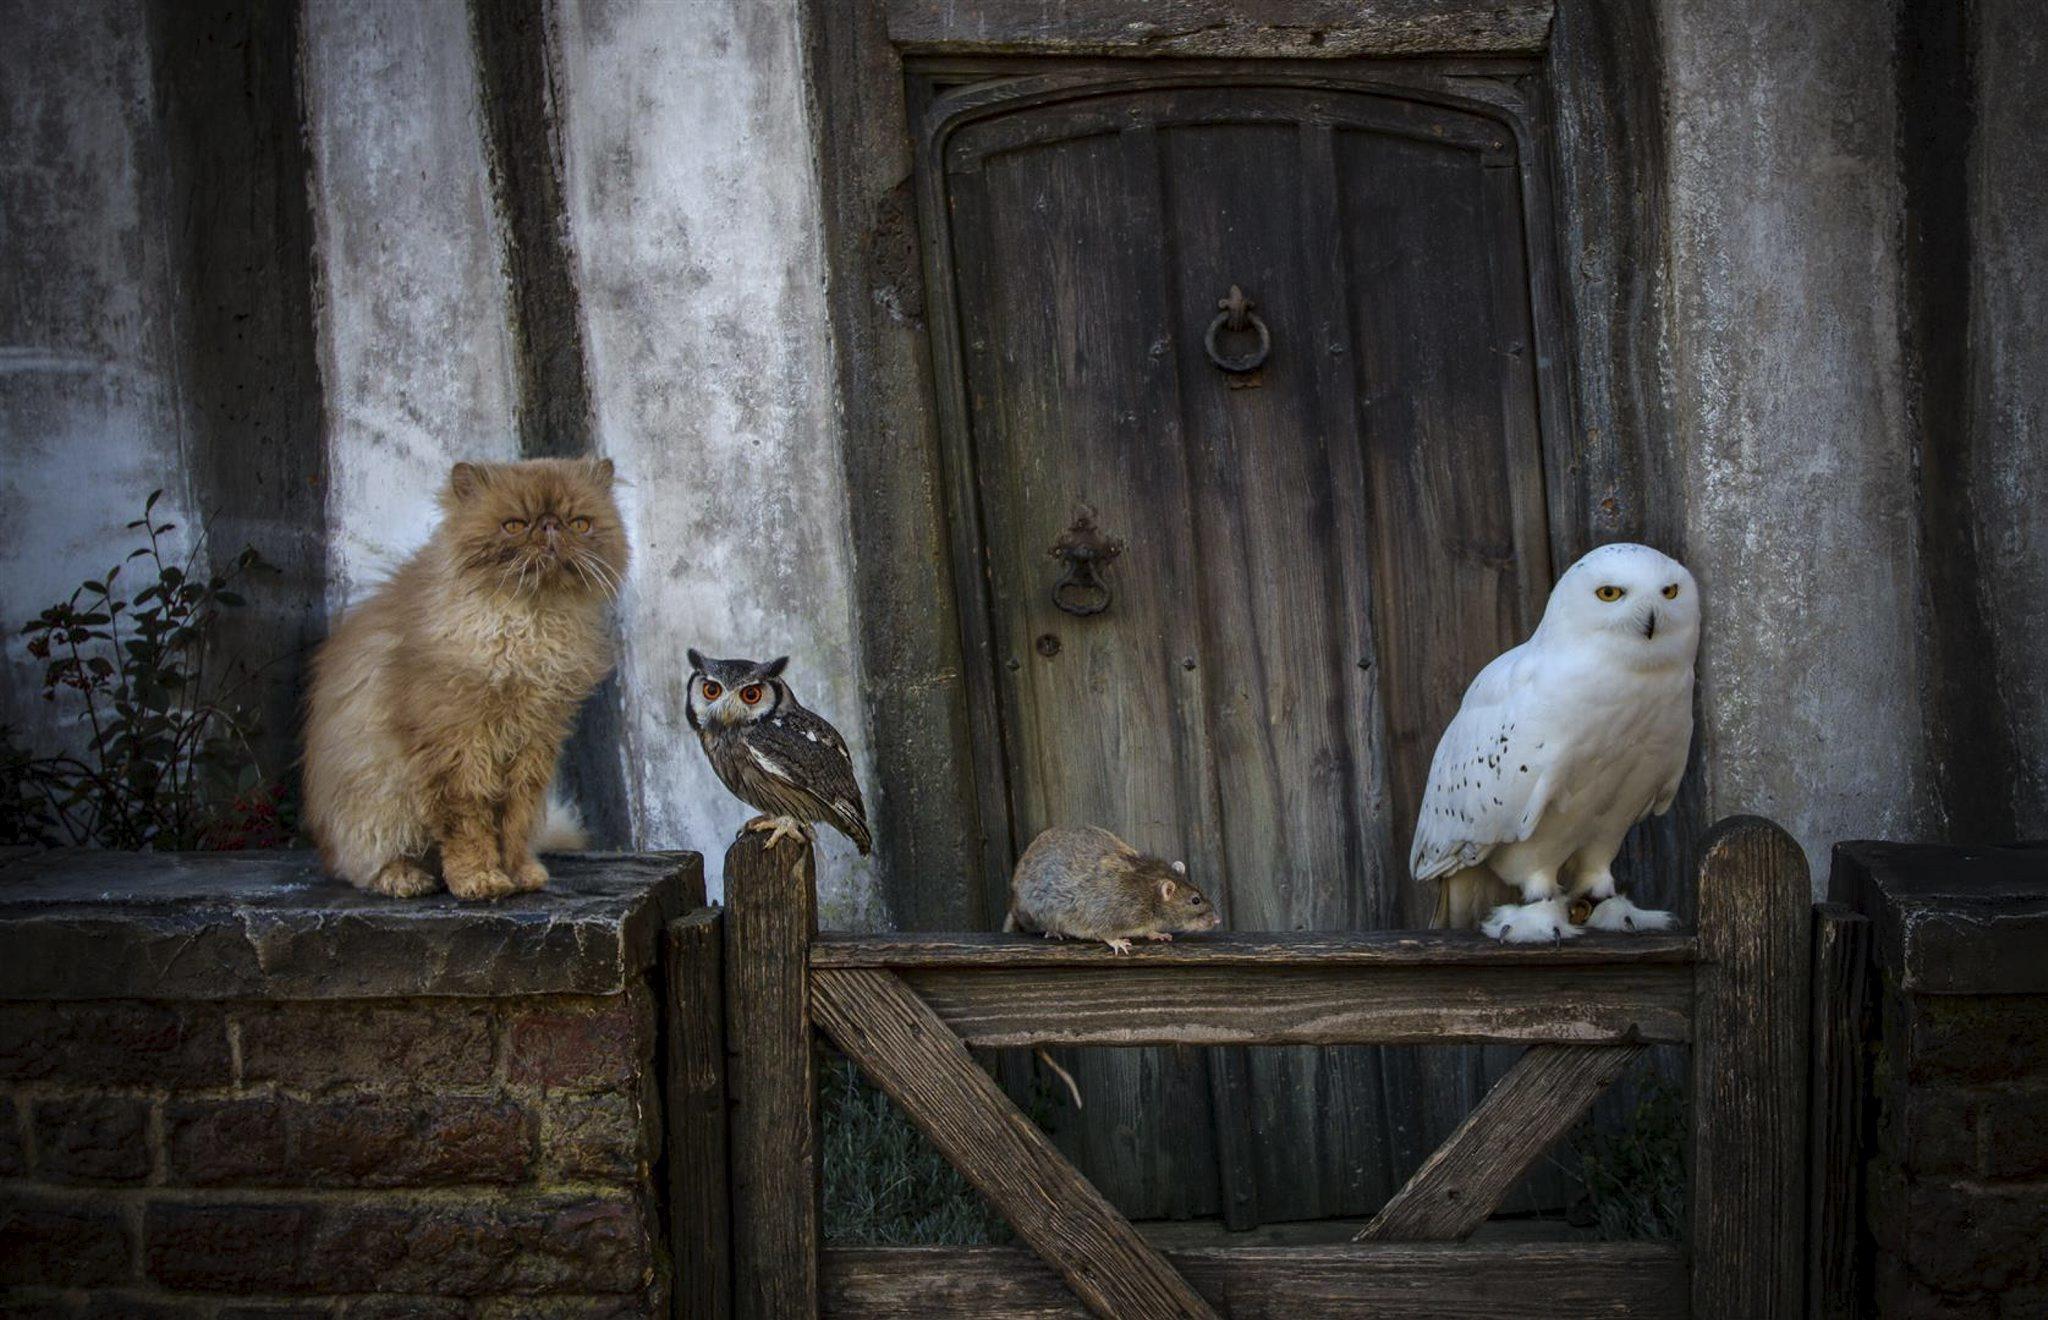 Lgbt Wallpaper Cute Animal Week At The Warner Bros Studio Tour The Making Of